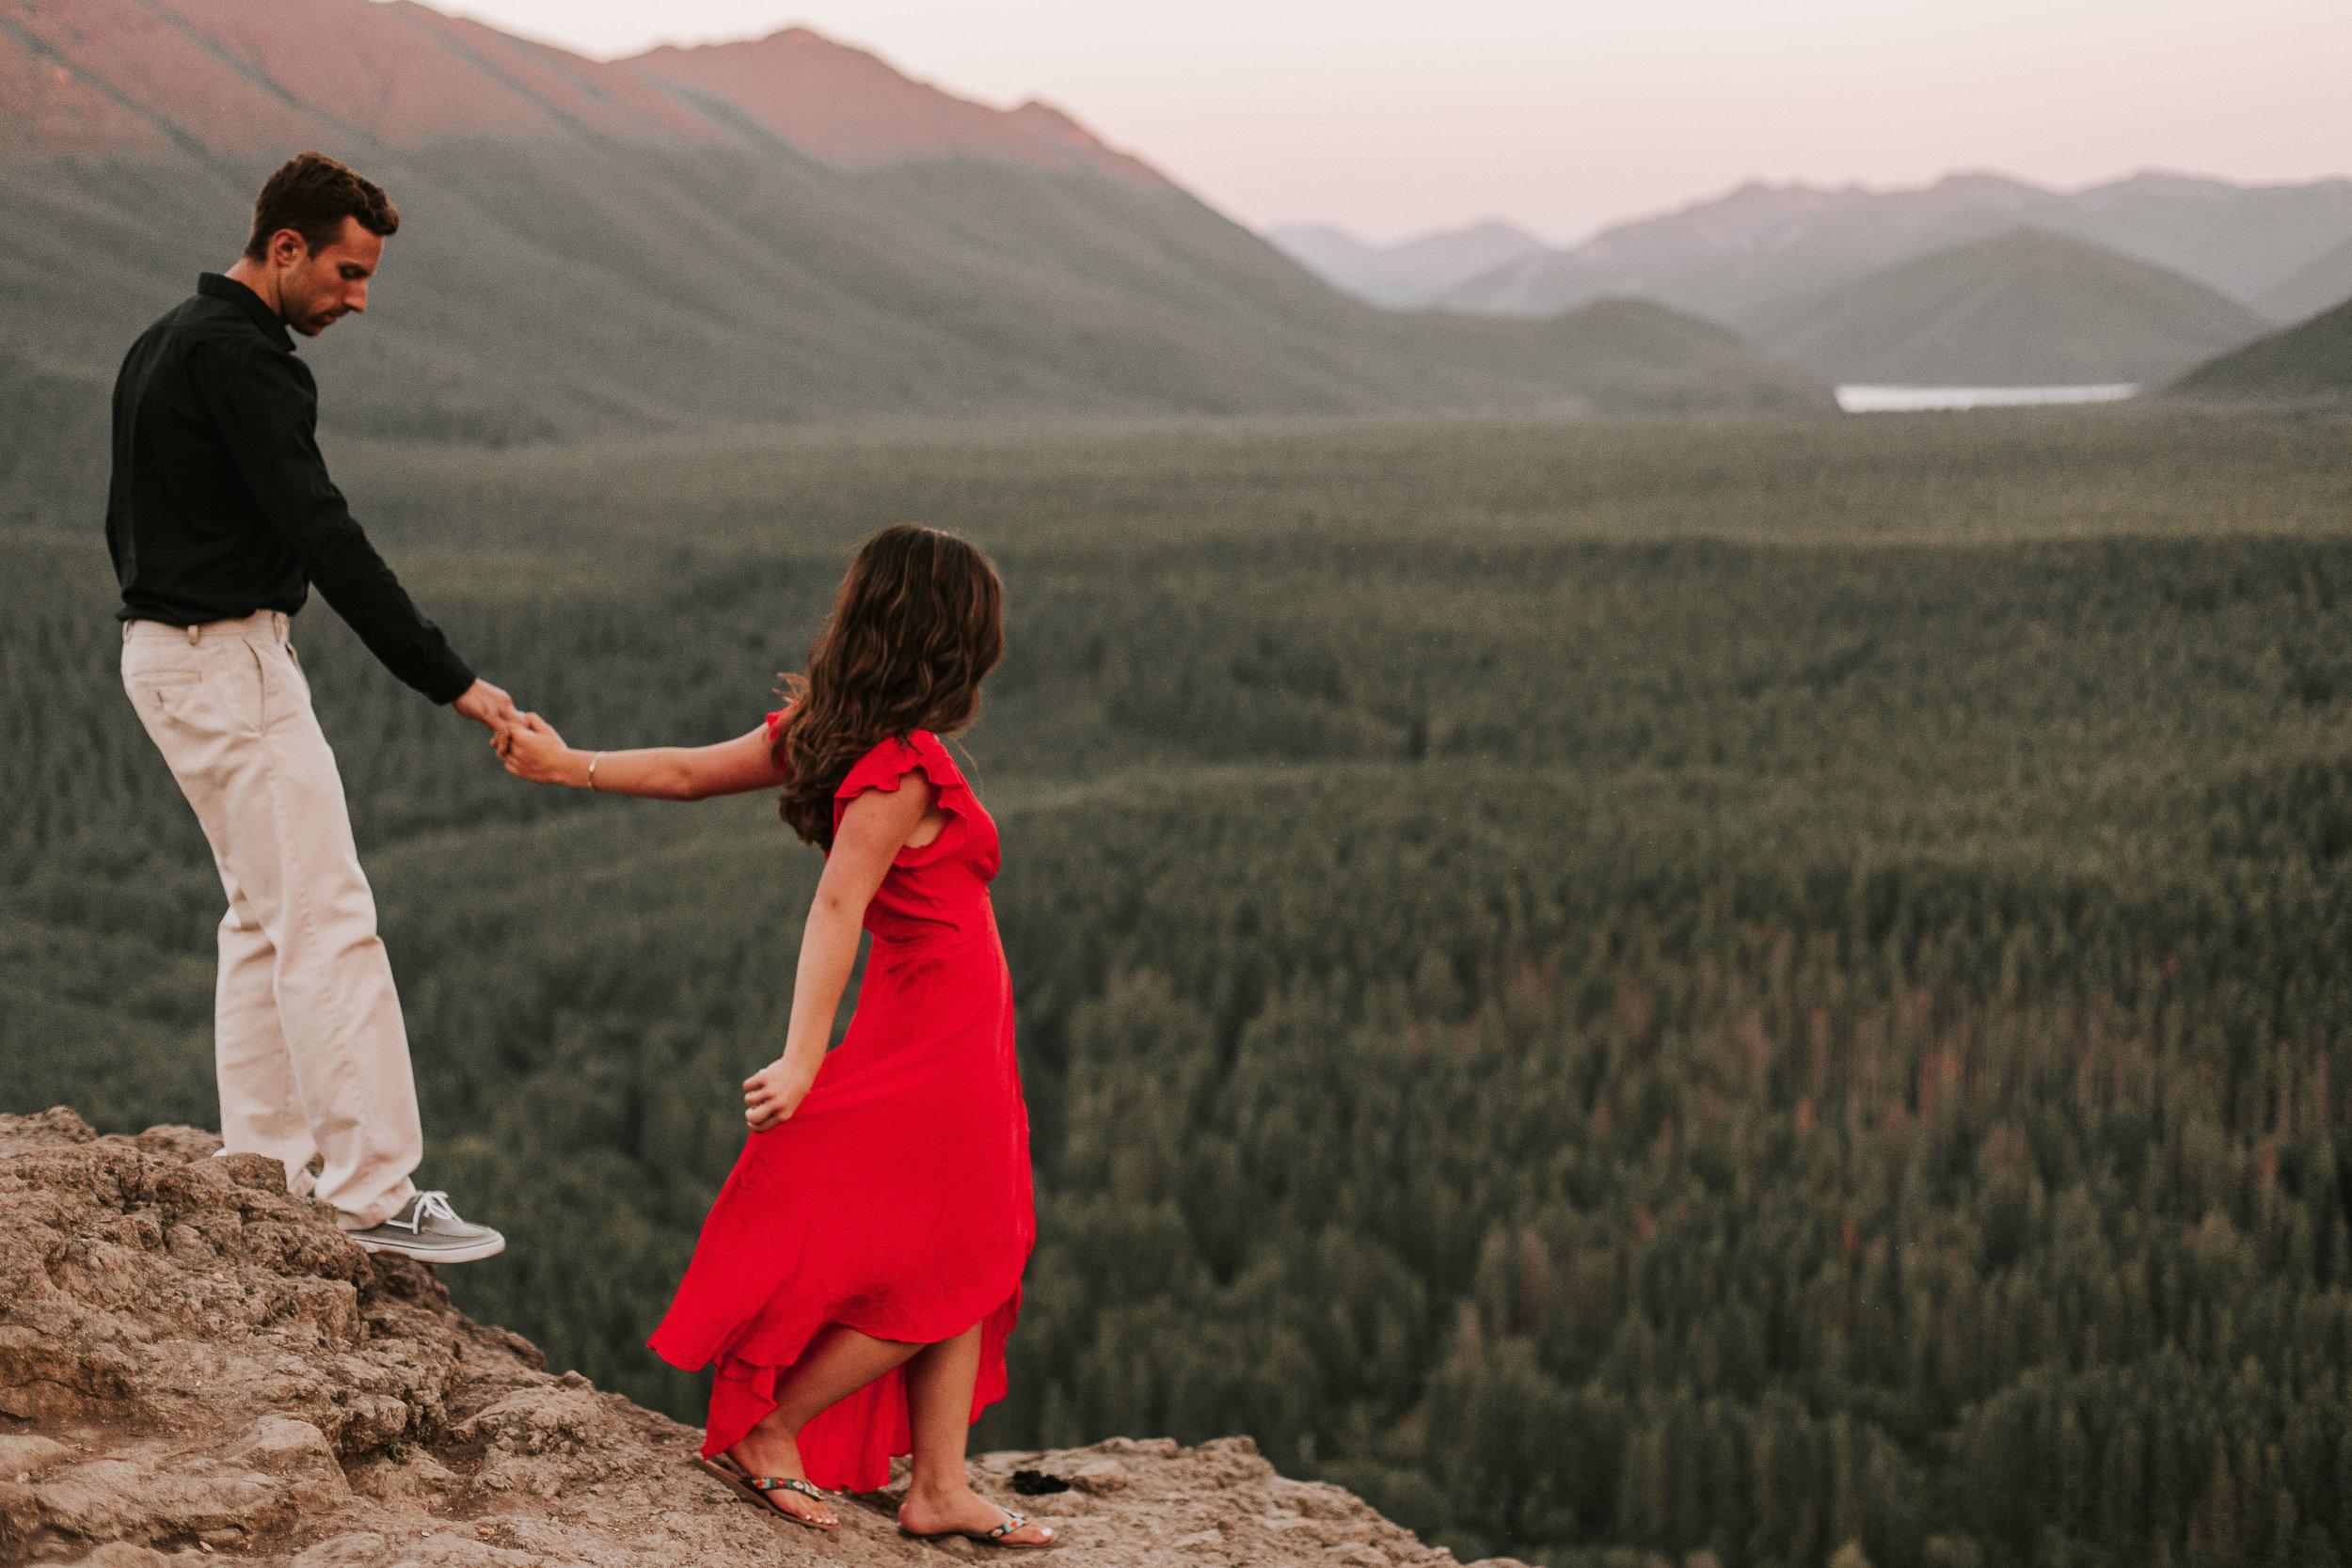 nicole-daacke-photography-rattlesnake-ridge-adventurous-engagement-session-hiking-seattle-washington-destinatino-elopement-intimate-wedding-photographer-27.jpg